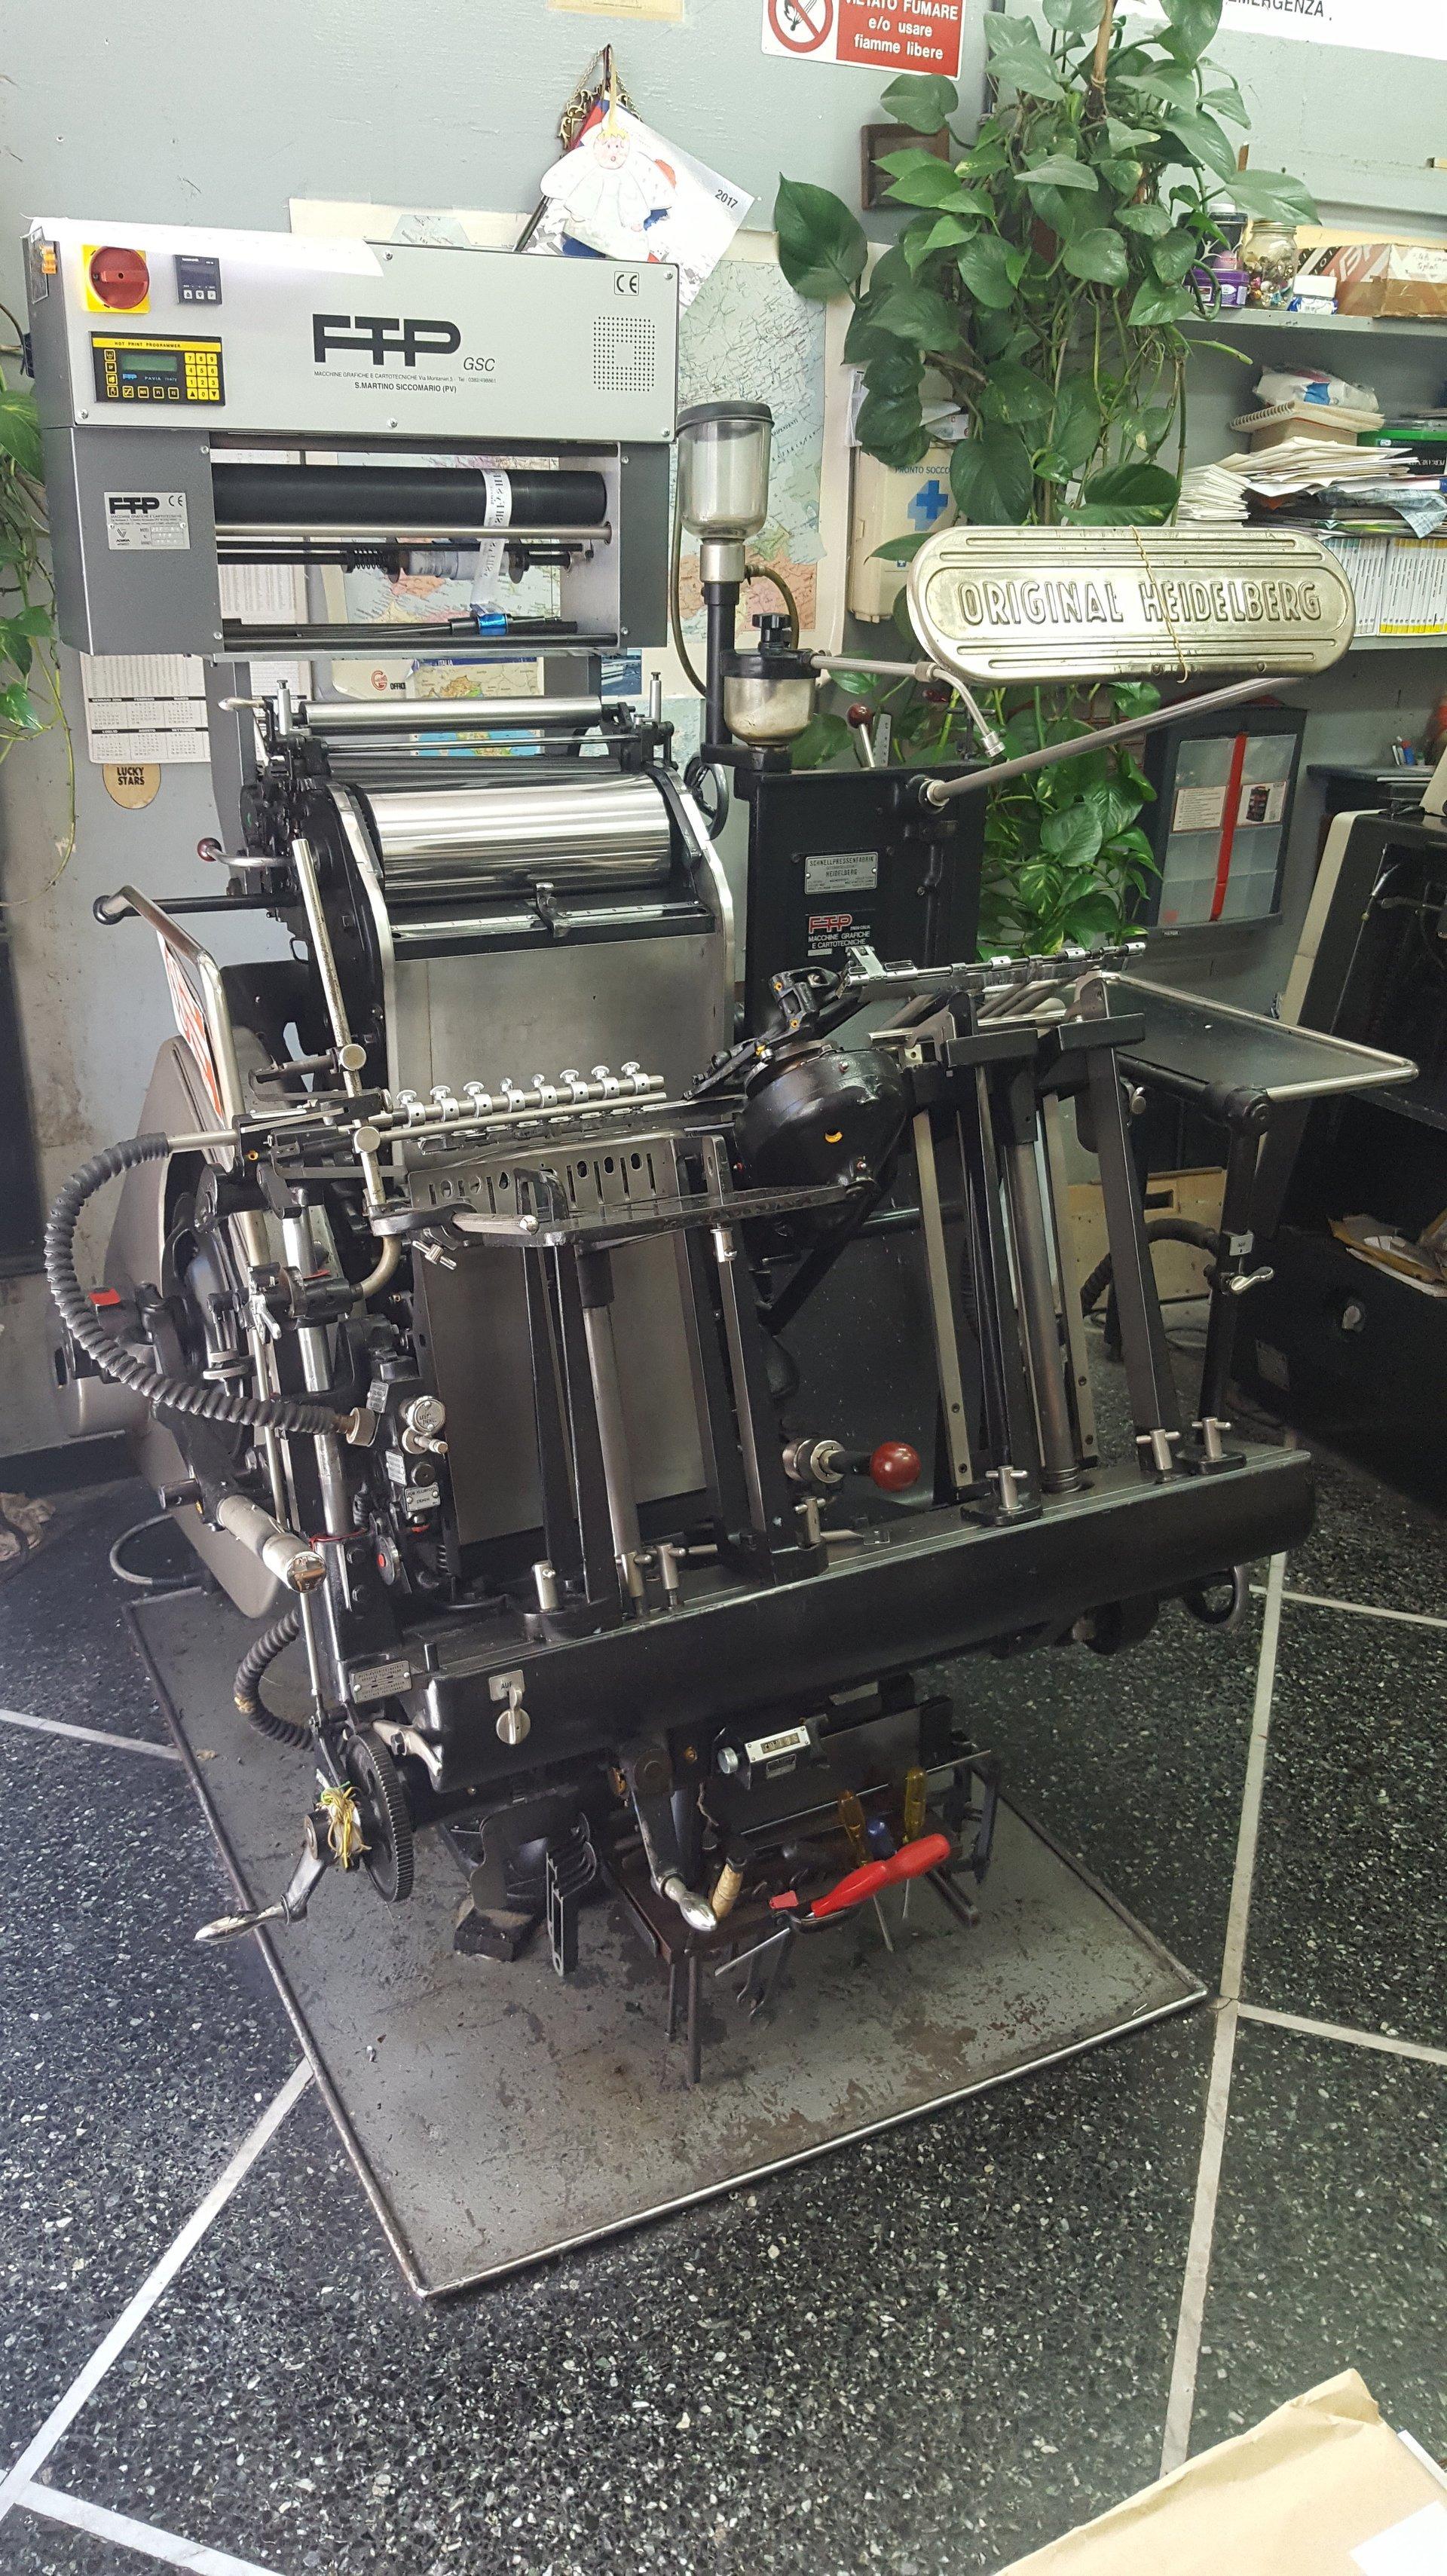 macchinari tipografia